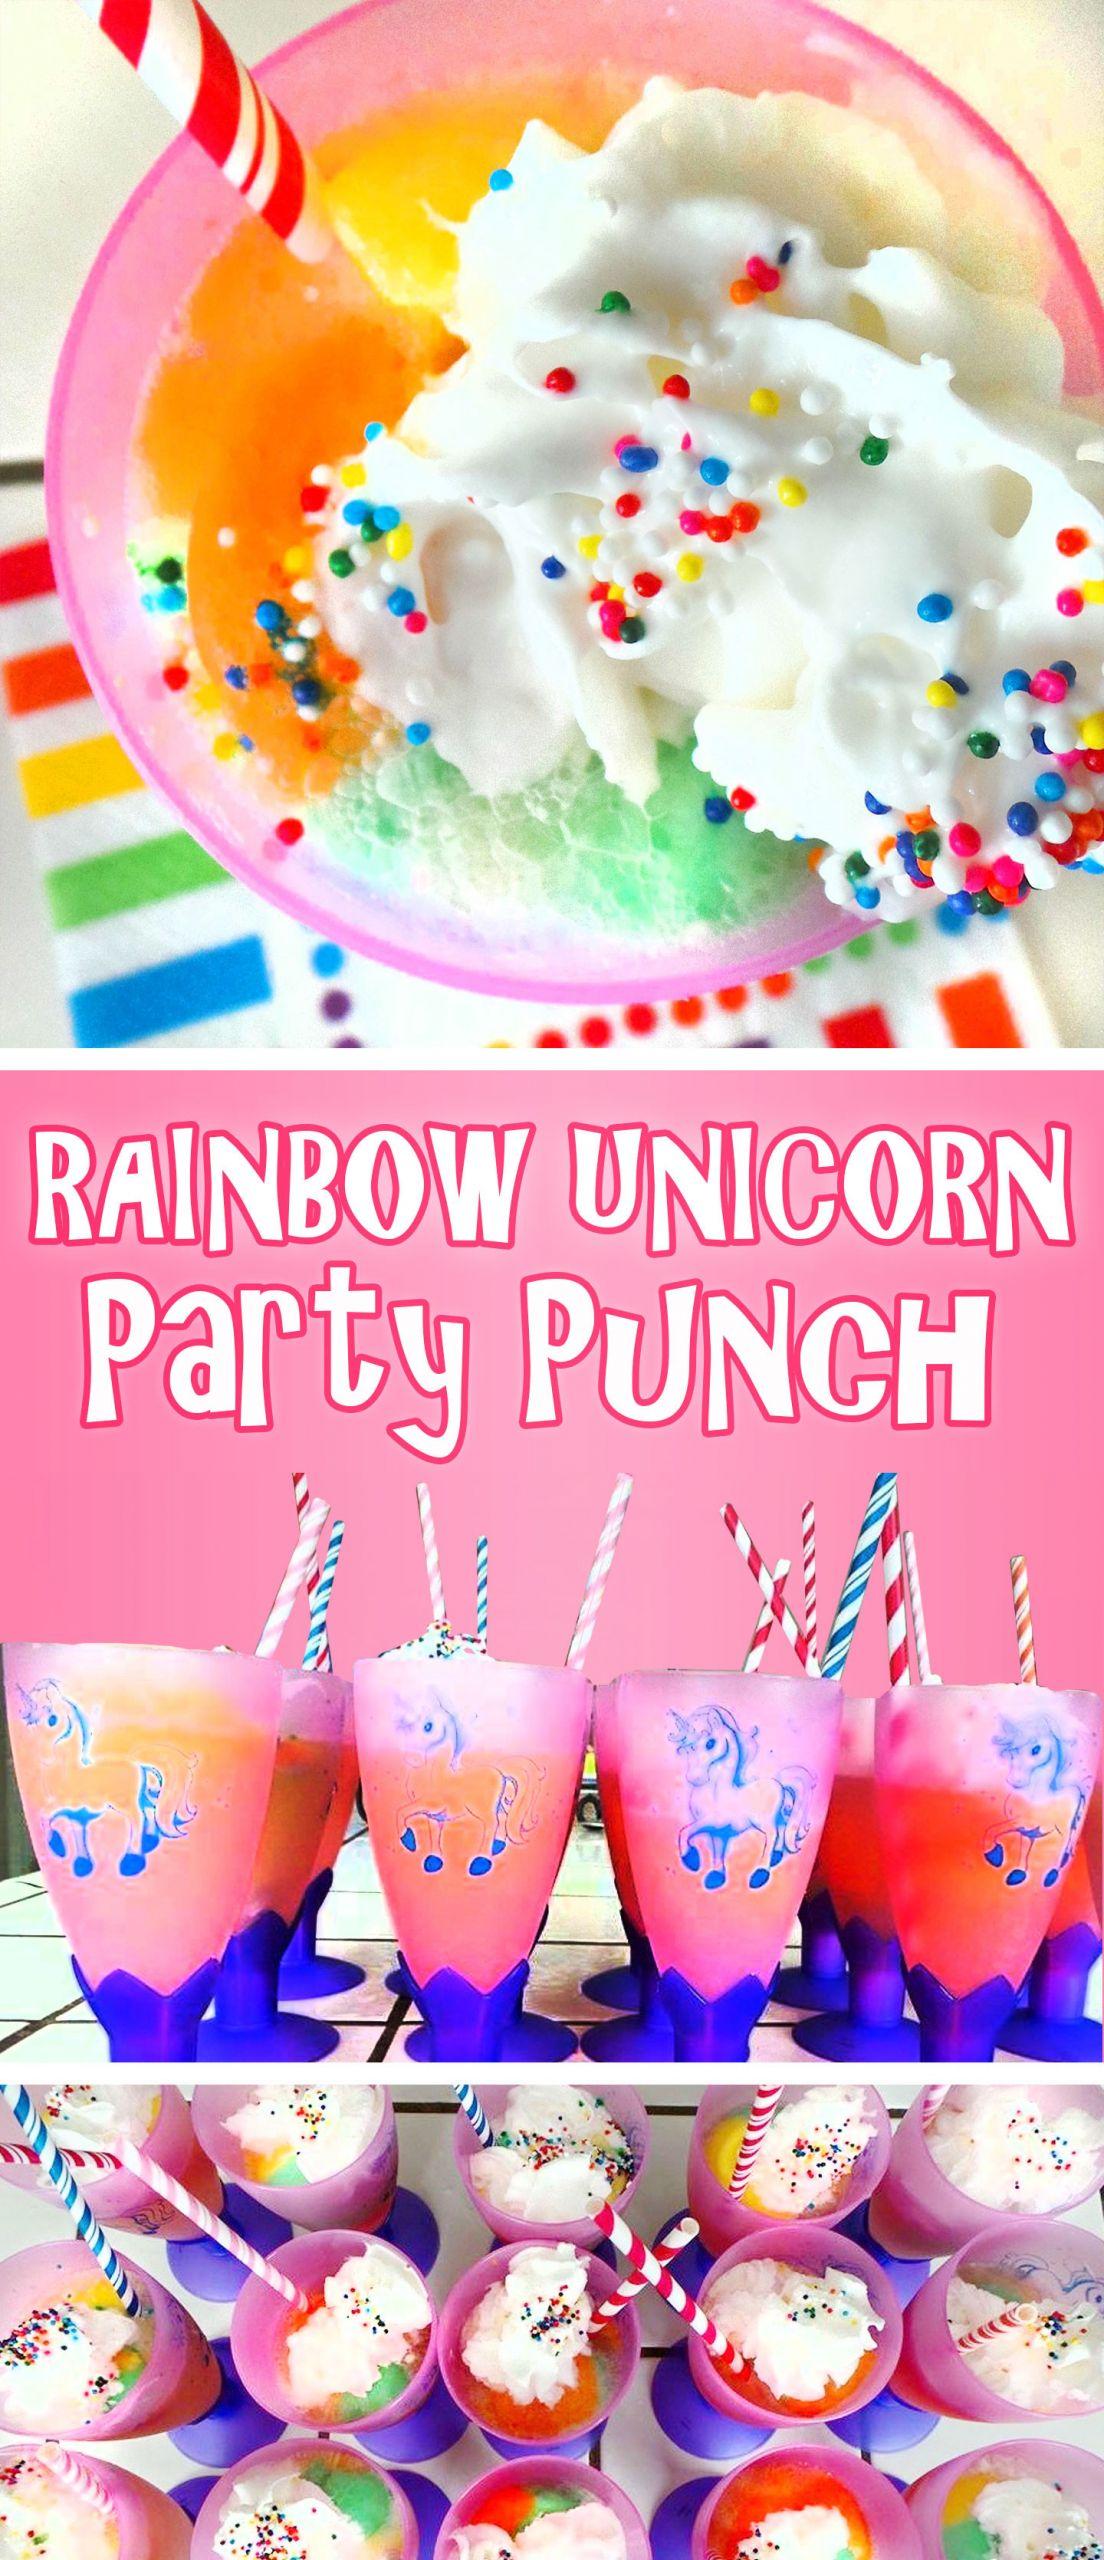 Unicorn Party Ideas Food  Rainbow Unicorn Party Punch